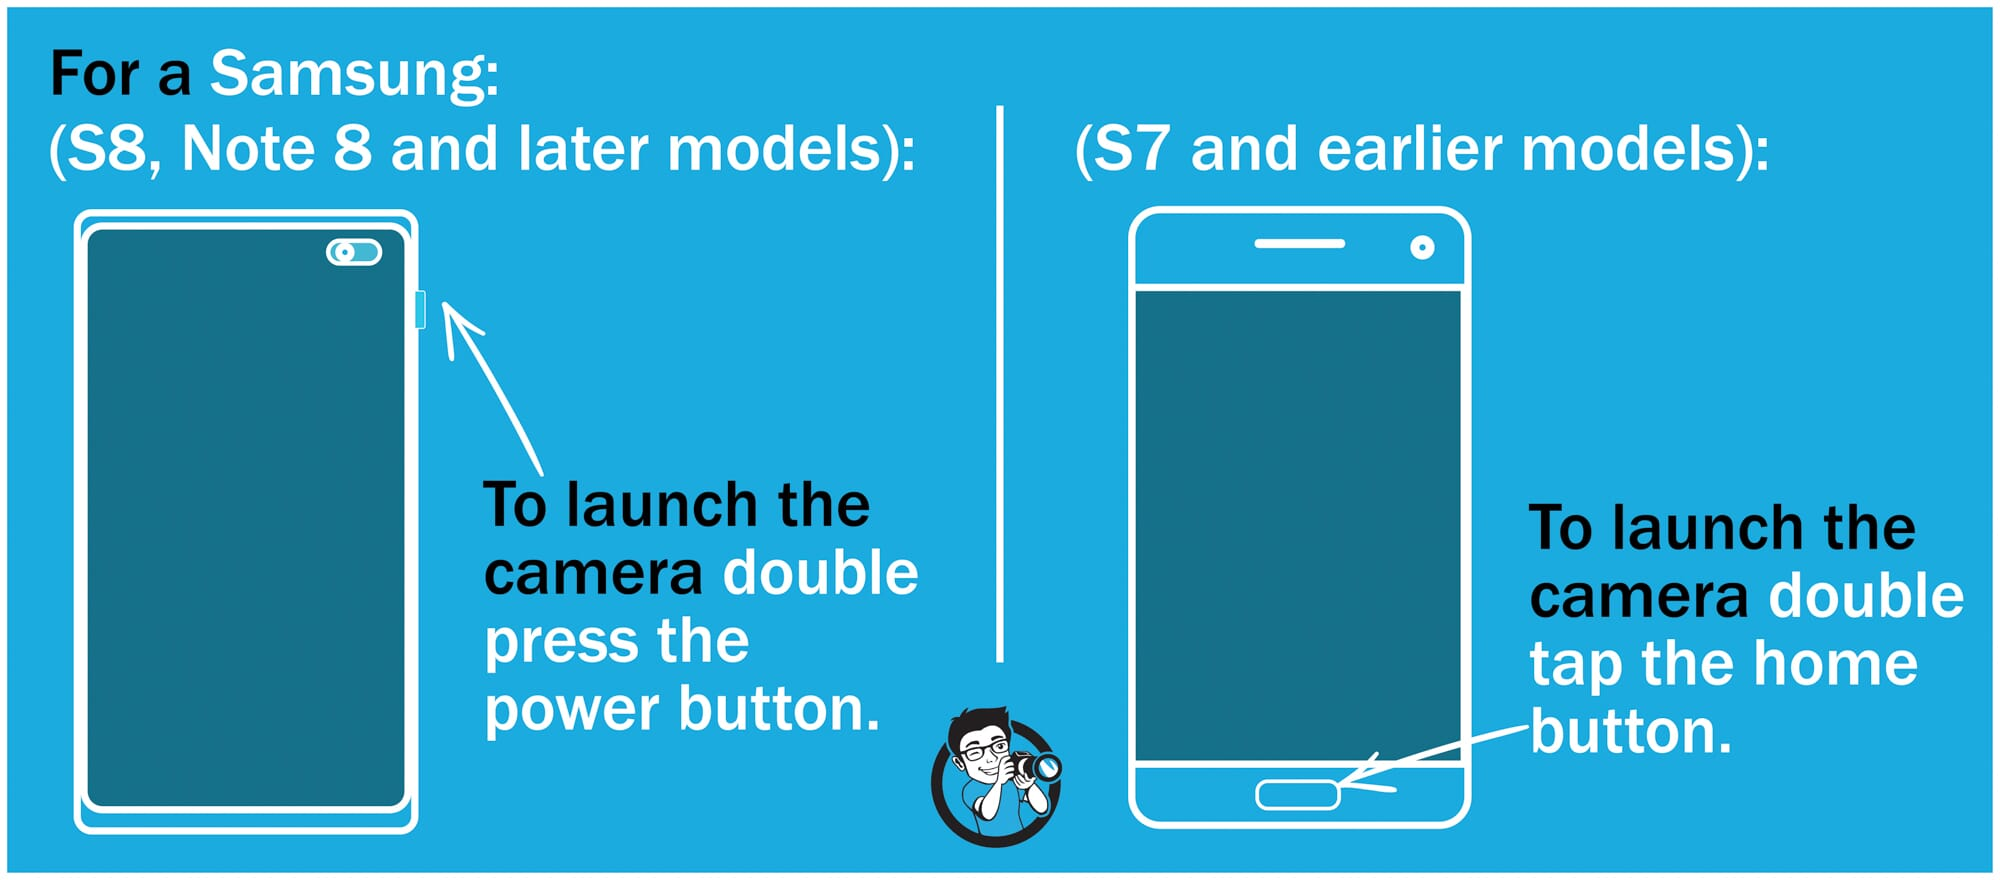 smasung models open smartphone camera